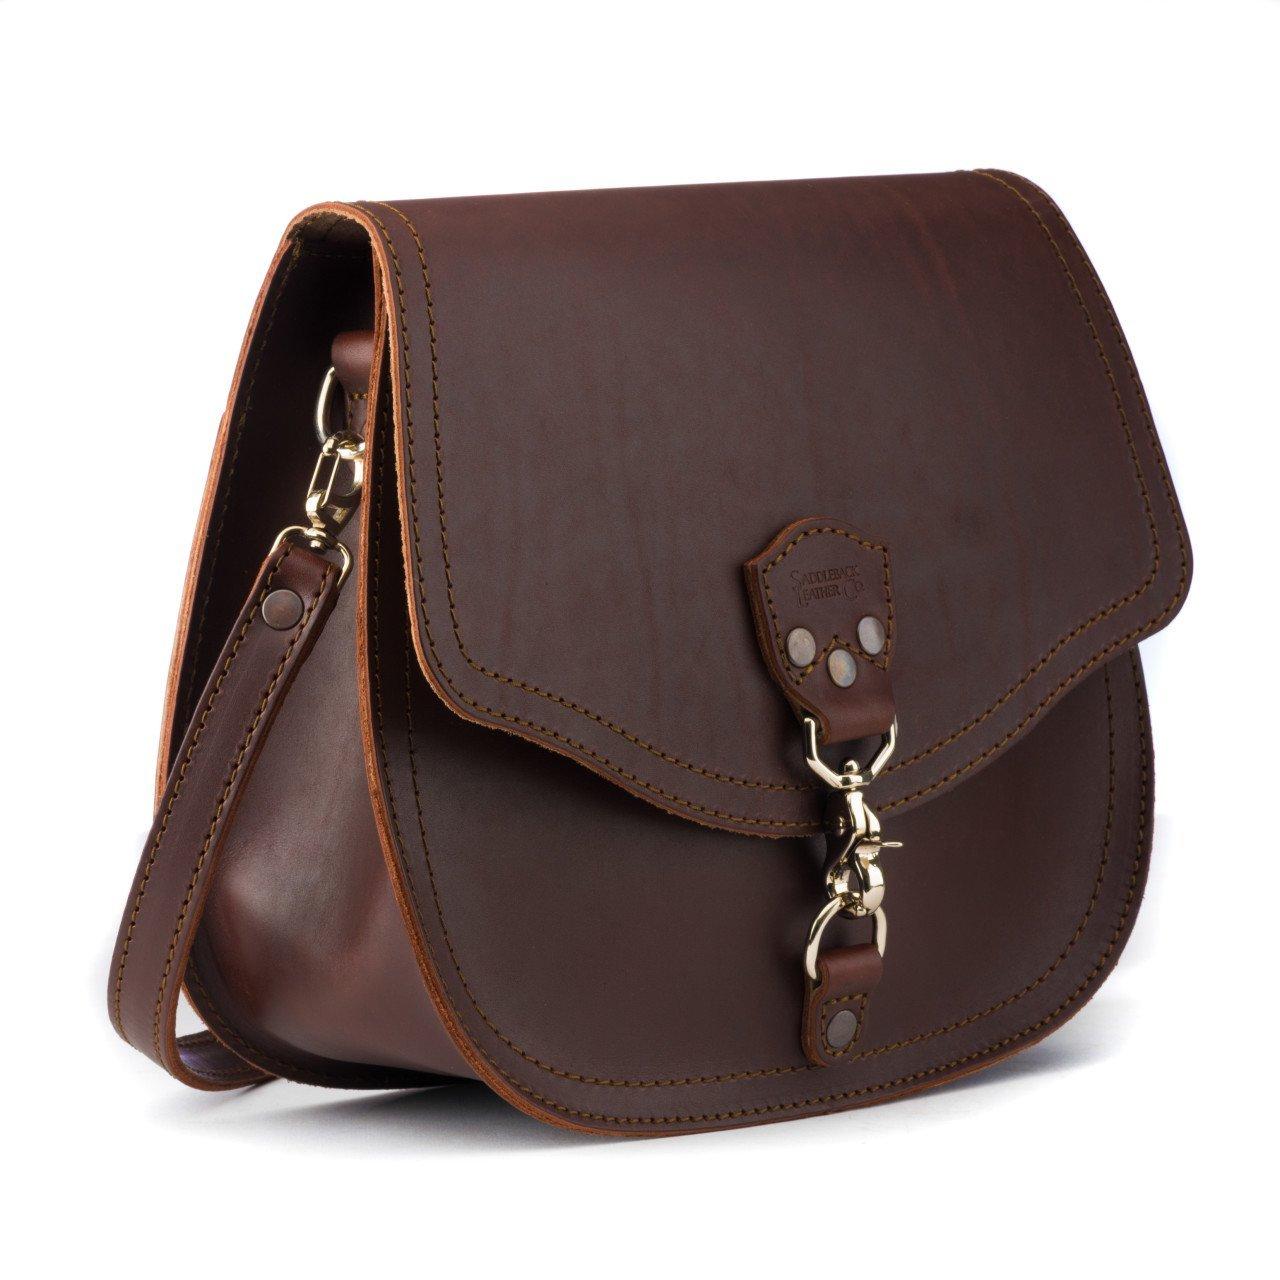 Saddleback Leather Hobo Crossbody Purse - Casual, Comfortable Handbag for Women - 100 Year Warranty by Saddleback Leather Co.